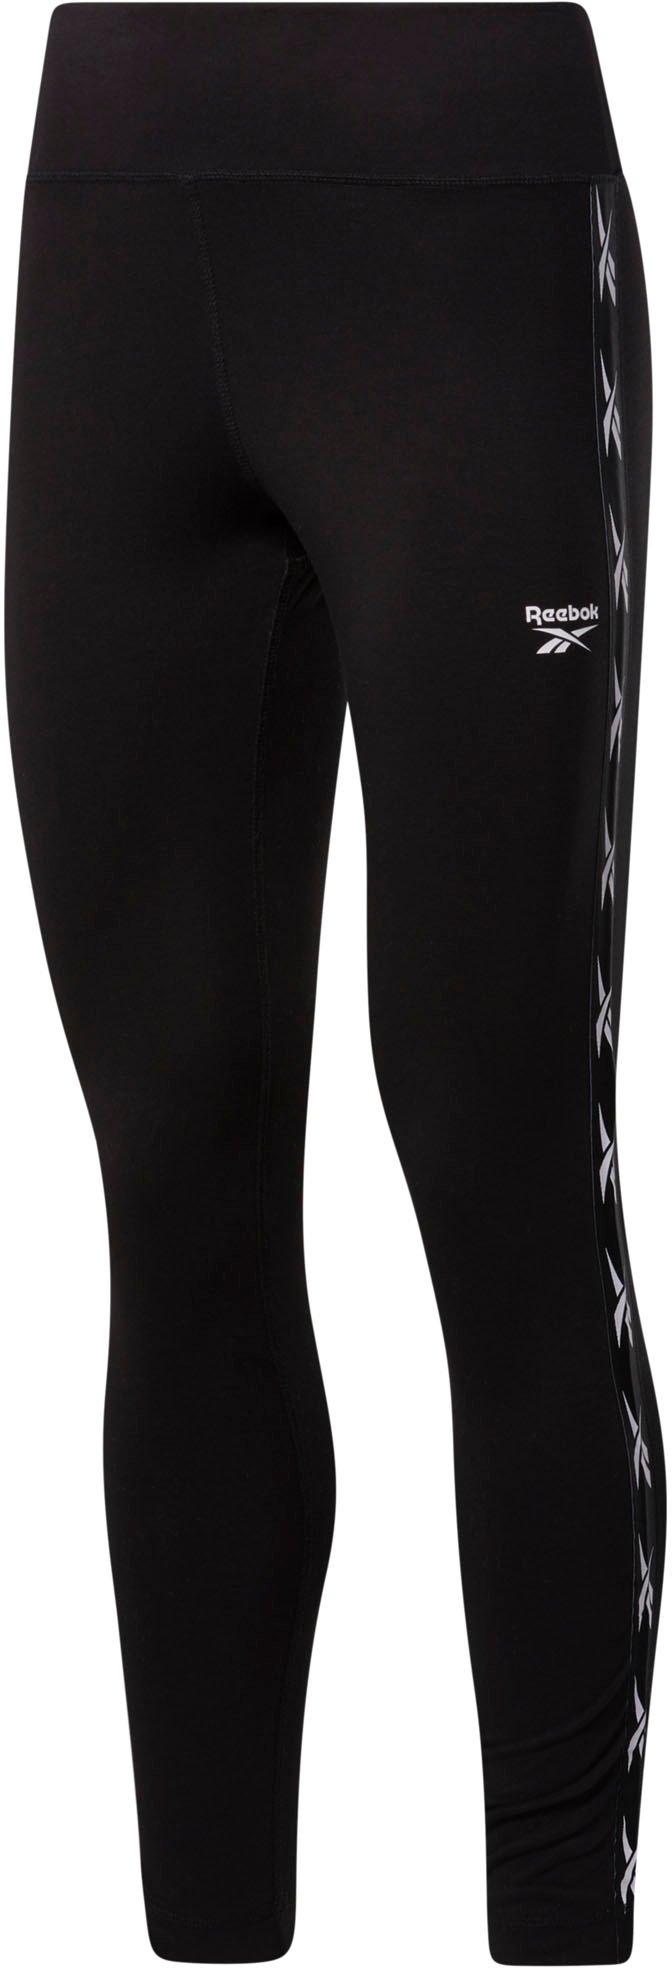 Reebok legging »TE Tape Pack Legging« bij OTTO online kopen